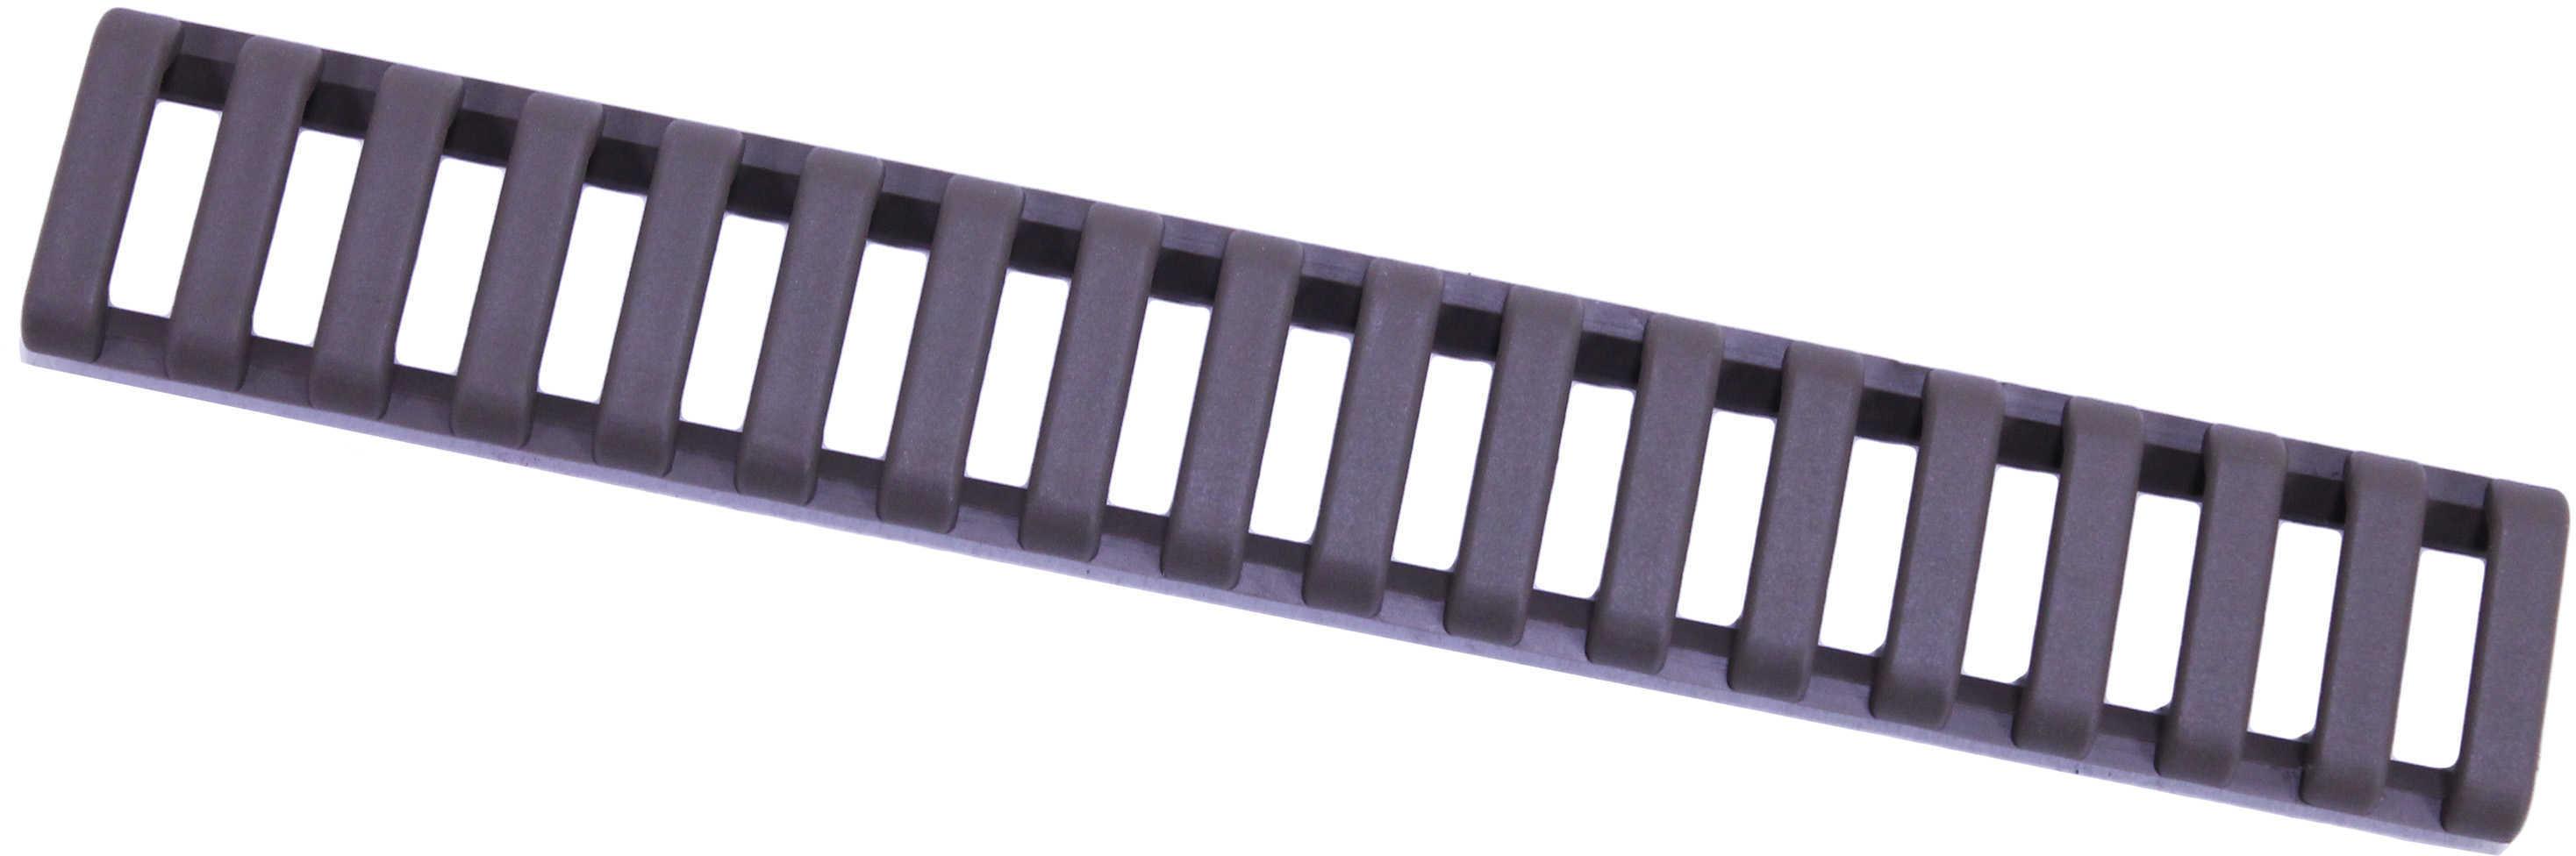 18 Slot Ladder Low Pro Rail Covers, 3-Pack Flat Dark Earth Md: 4373-3Pk-De